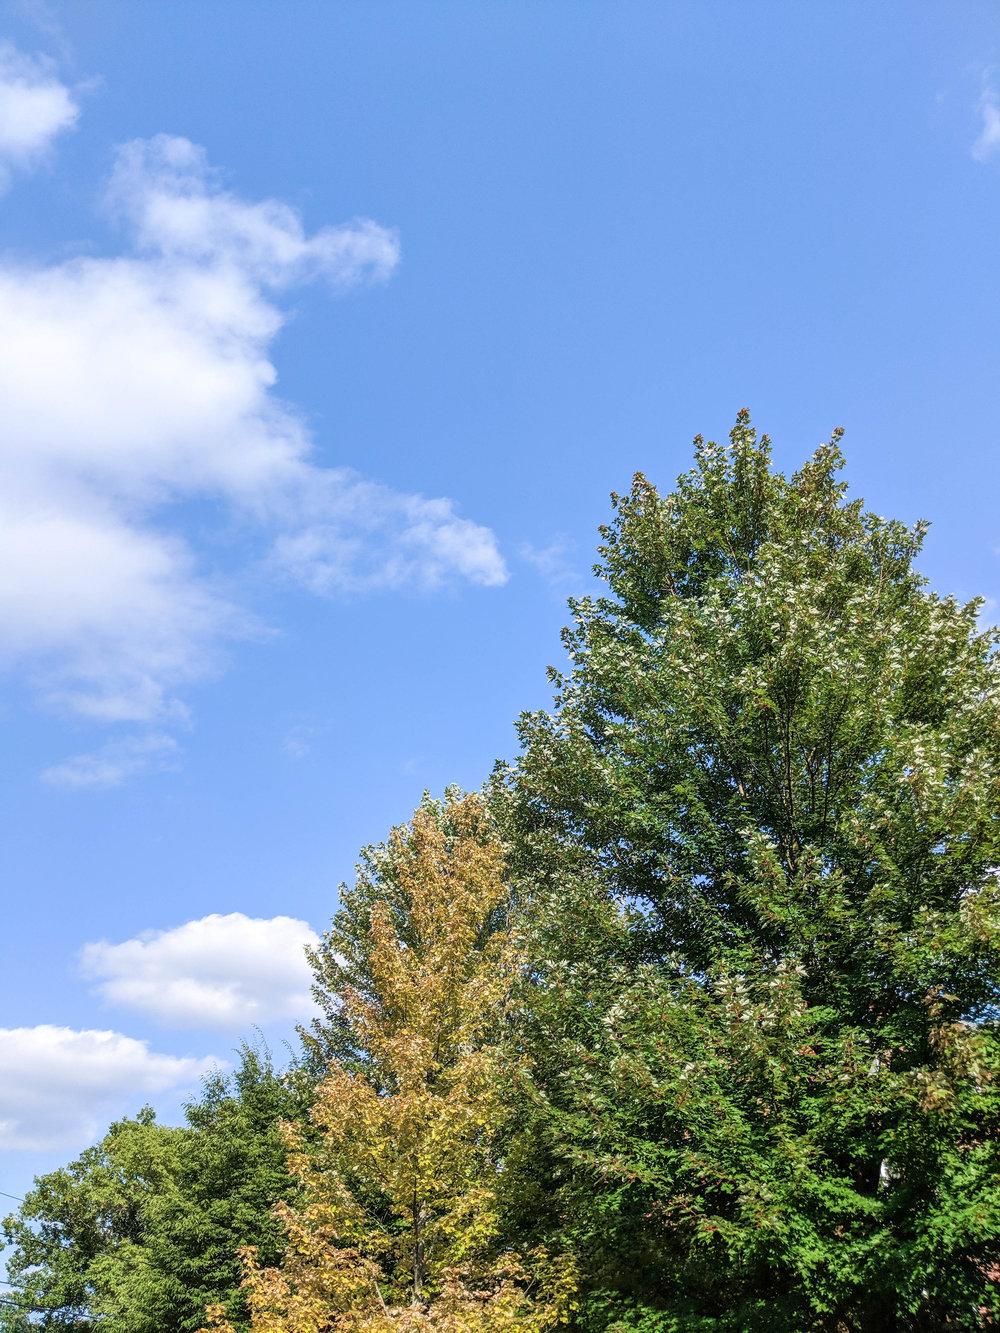 bri rinehart; photography; trees; nature